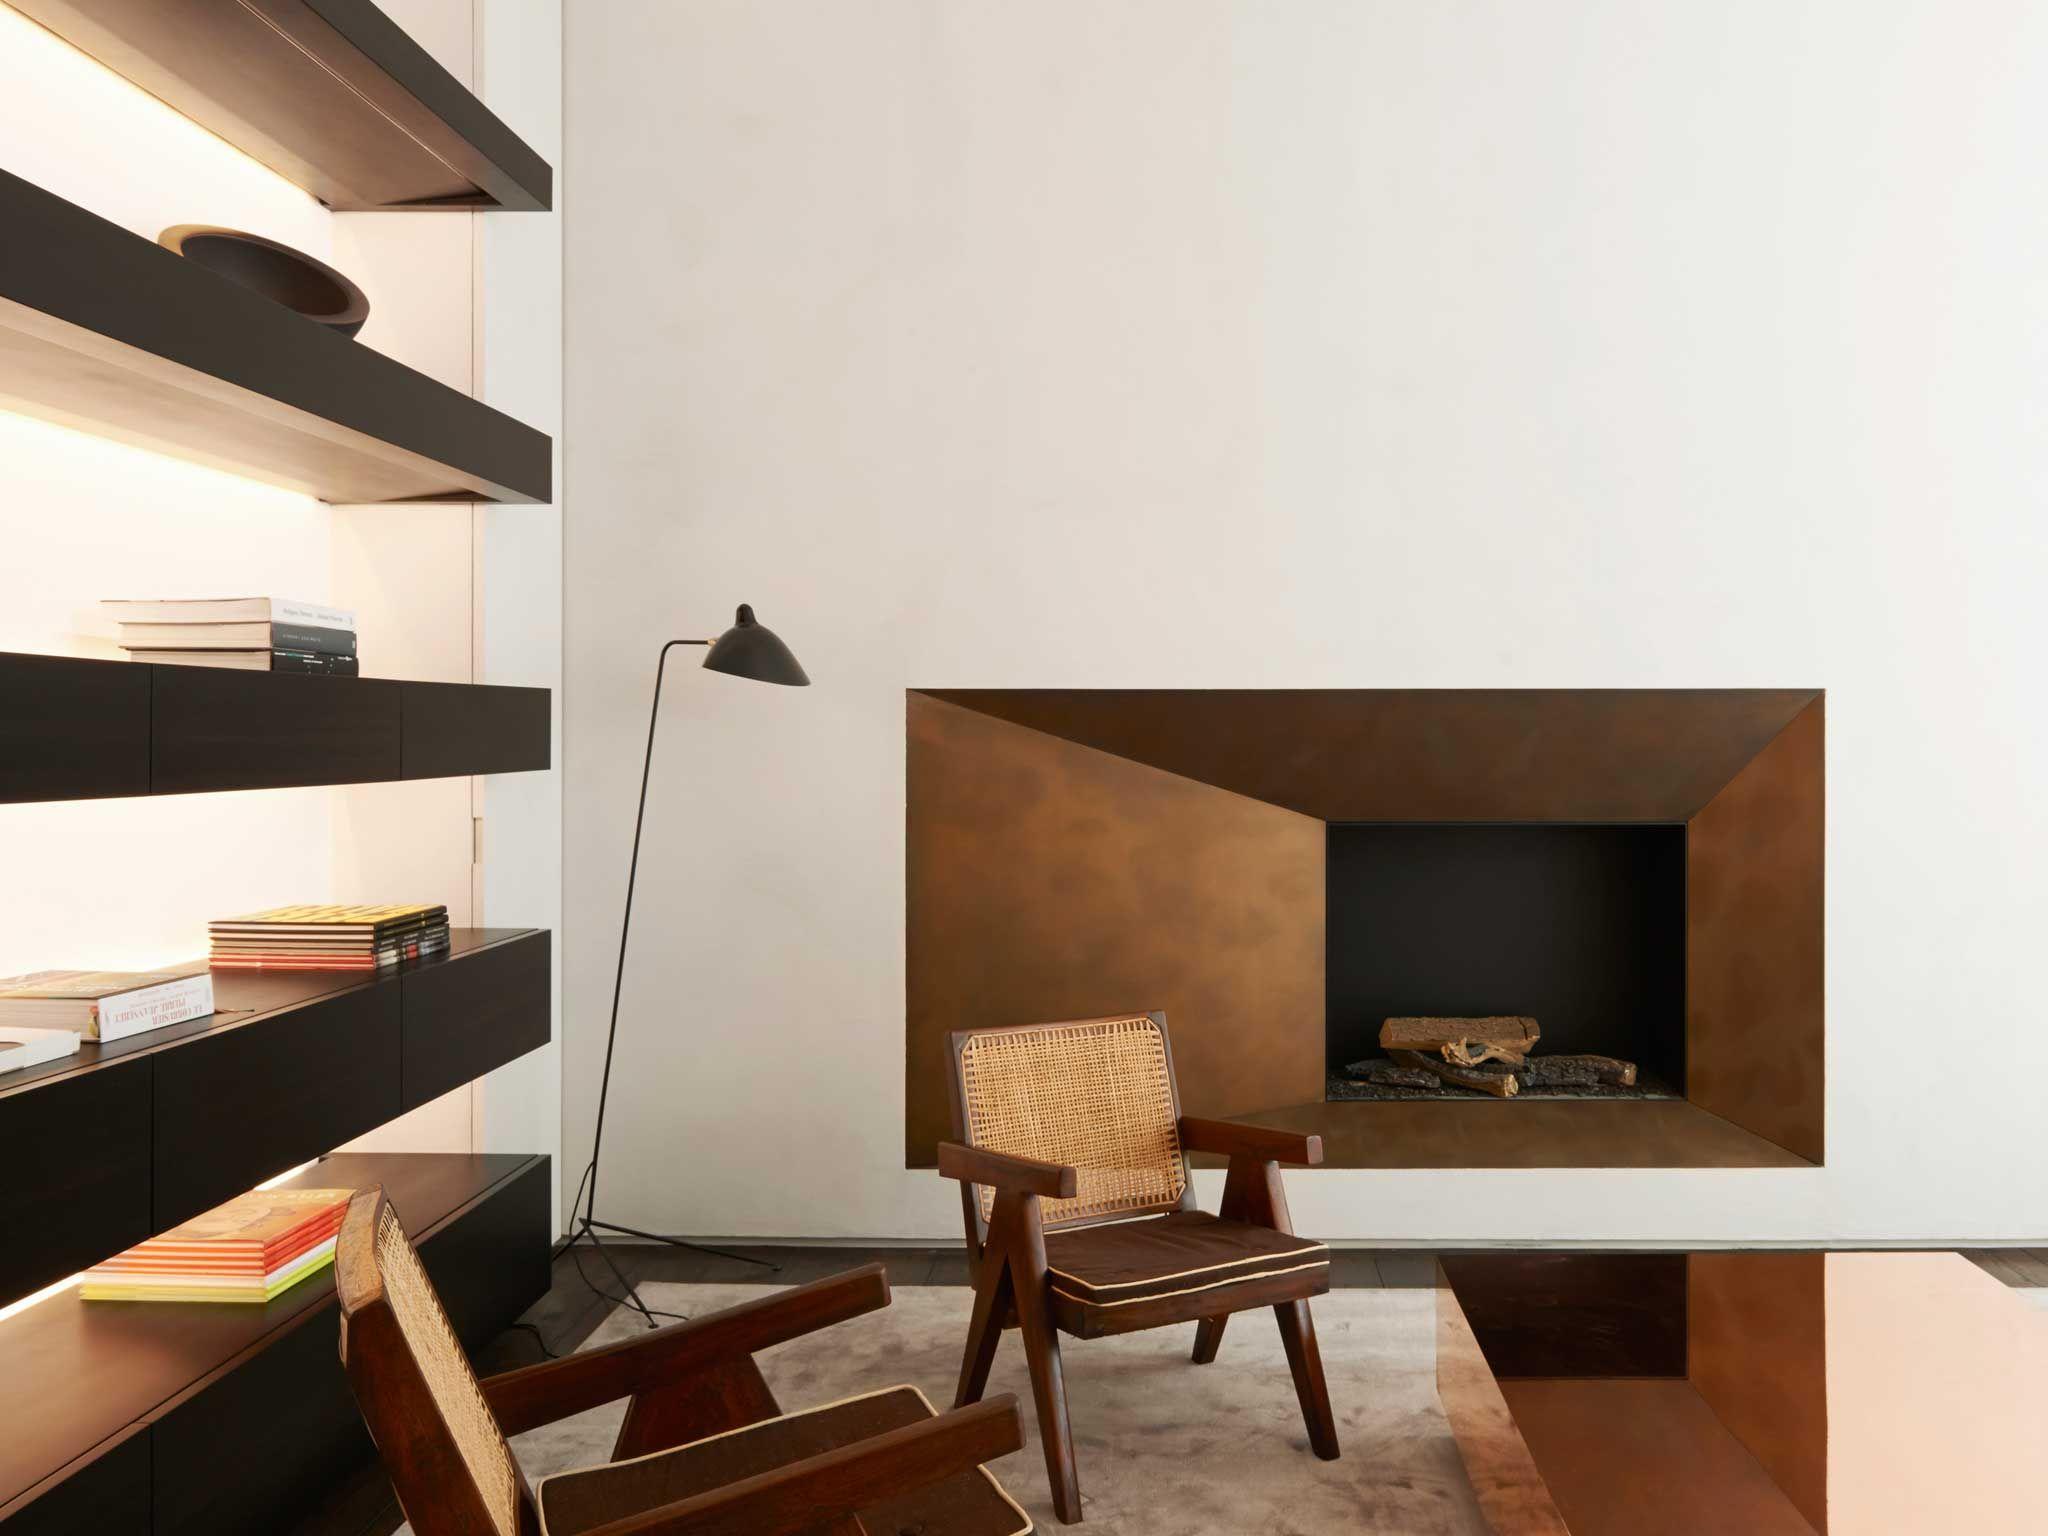 Living Room Shelves Design Obumex Living Room Shelves Design Furniture Armchair